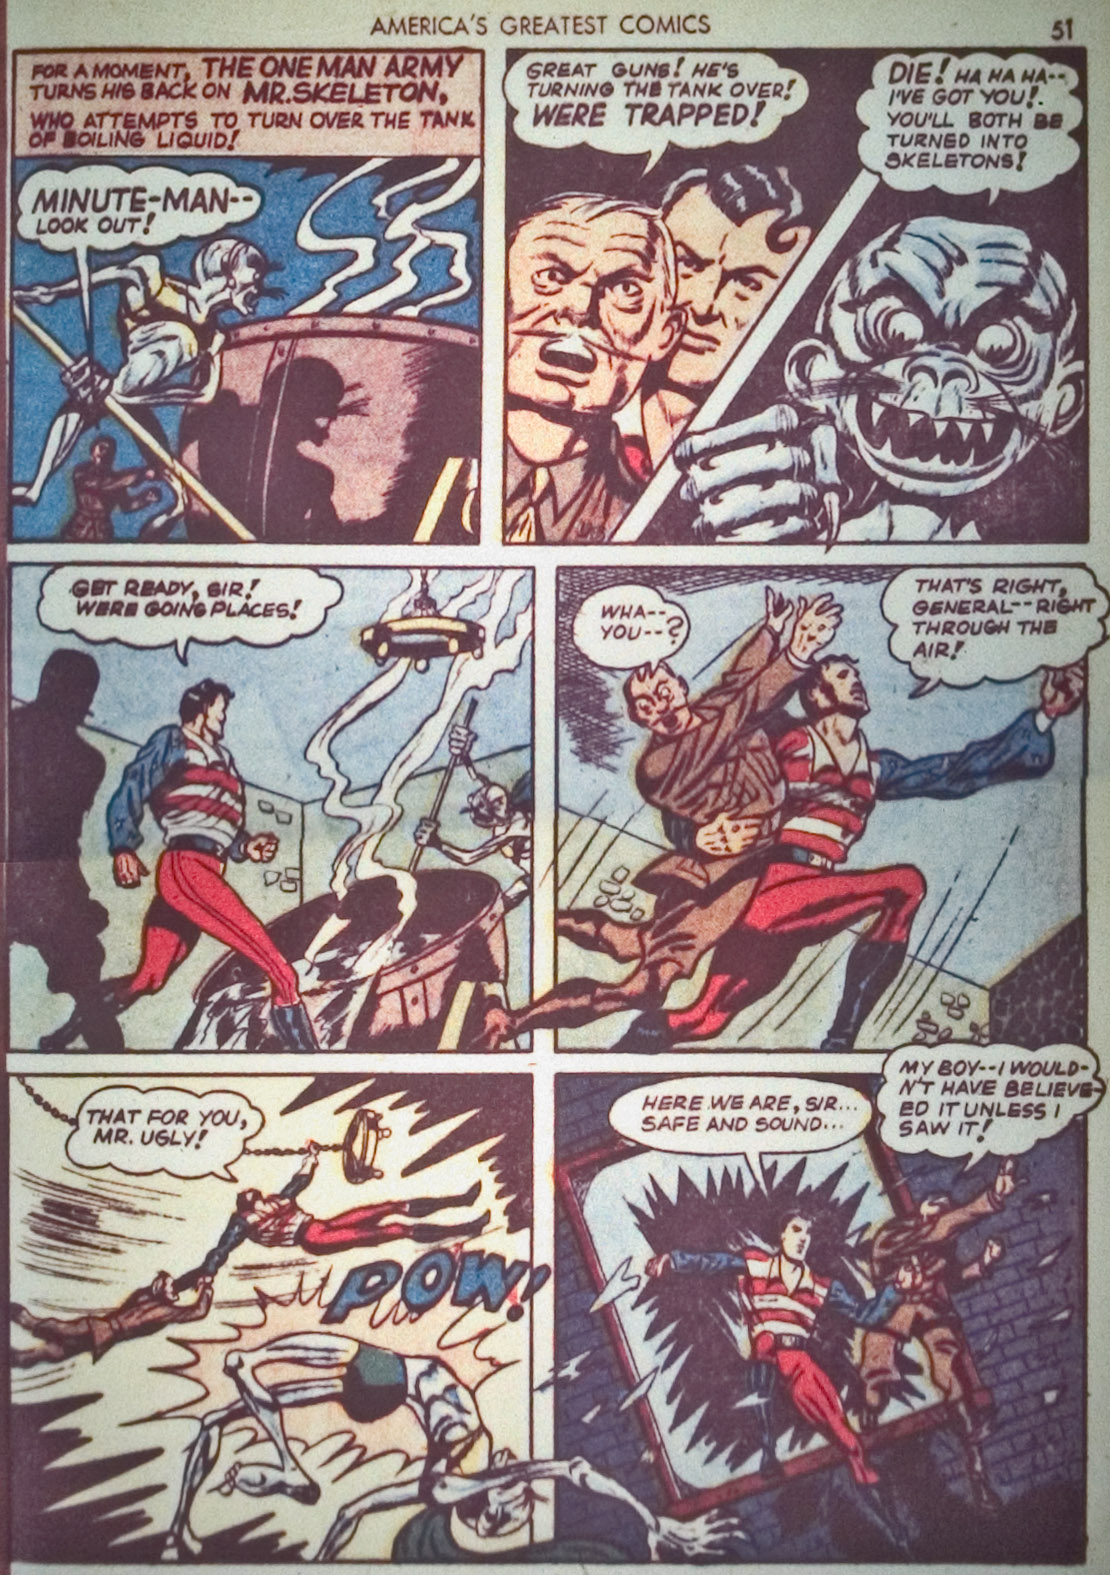 Read online America's Greatest Comics comic -  Issue #1 - 54